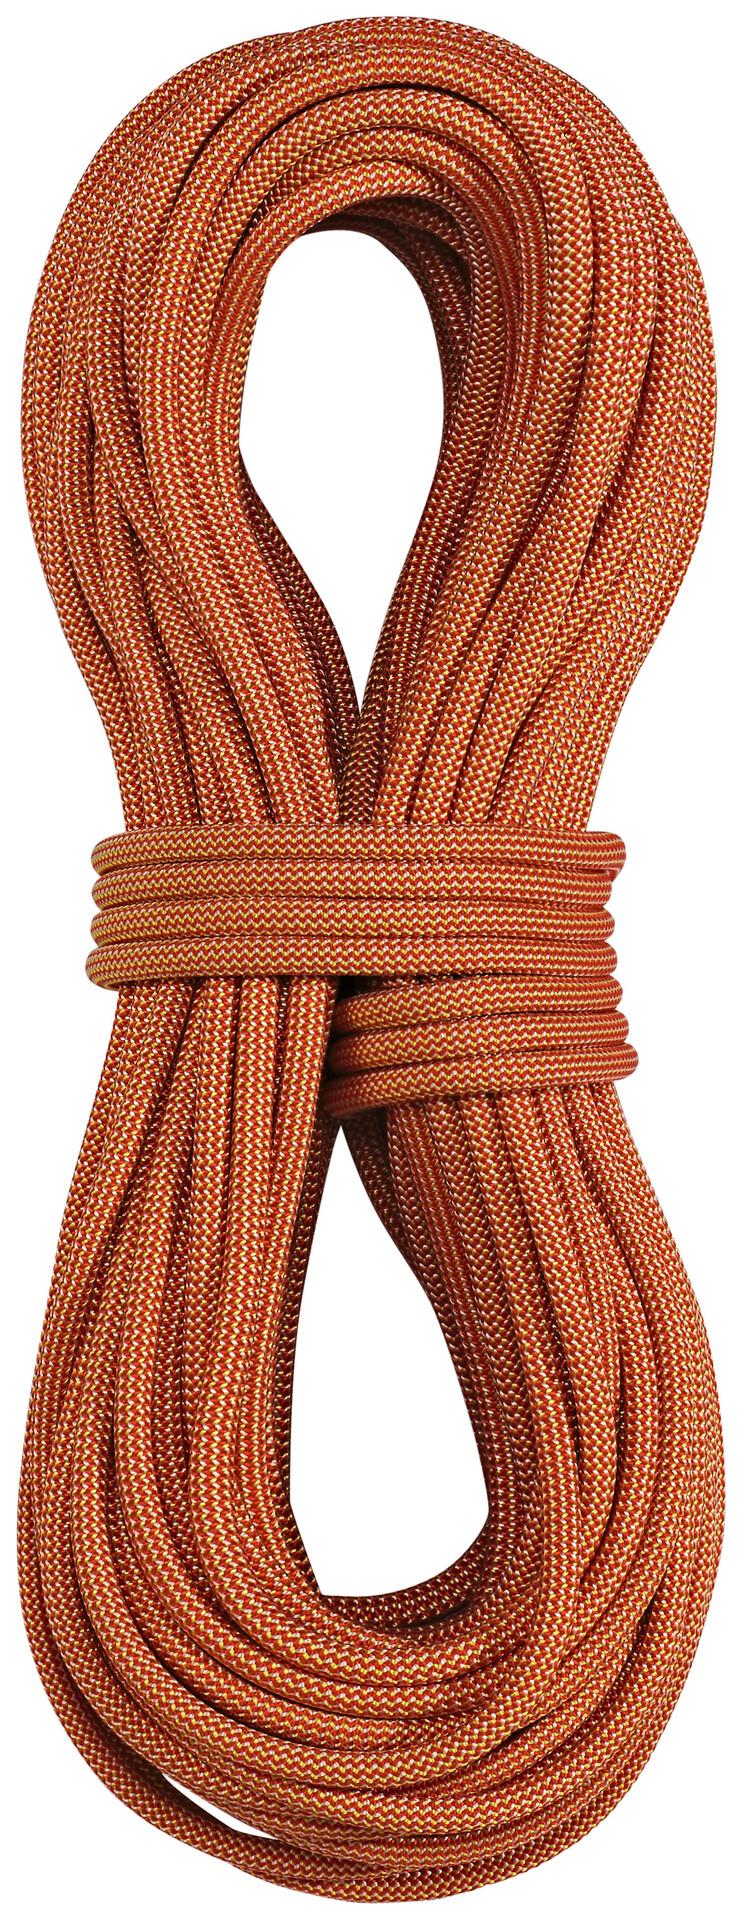 Edelrid Boa Rope Rope Rope 9,8mm/60m röd/gul 53e99b